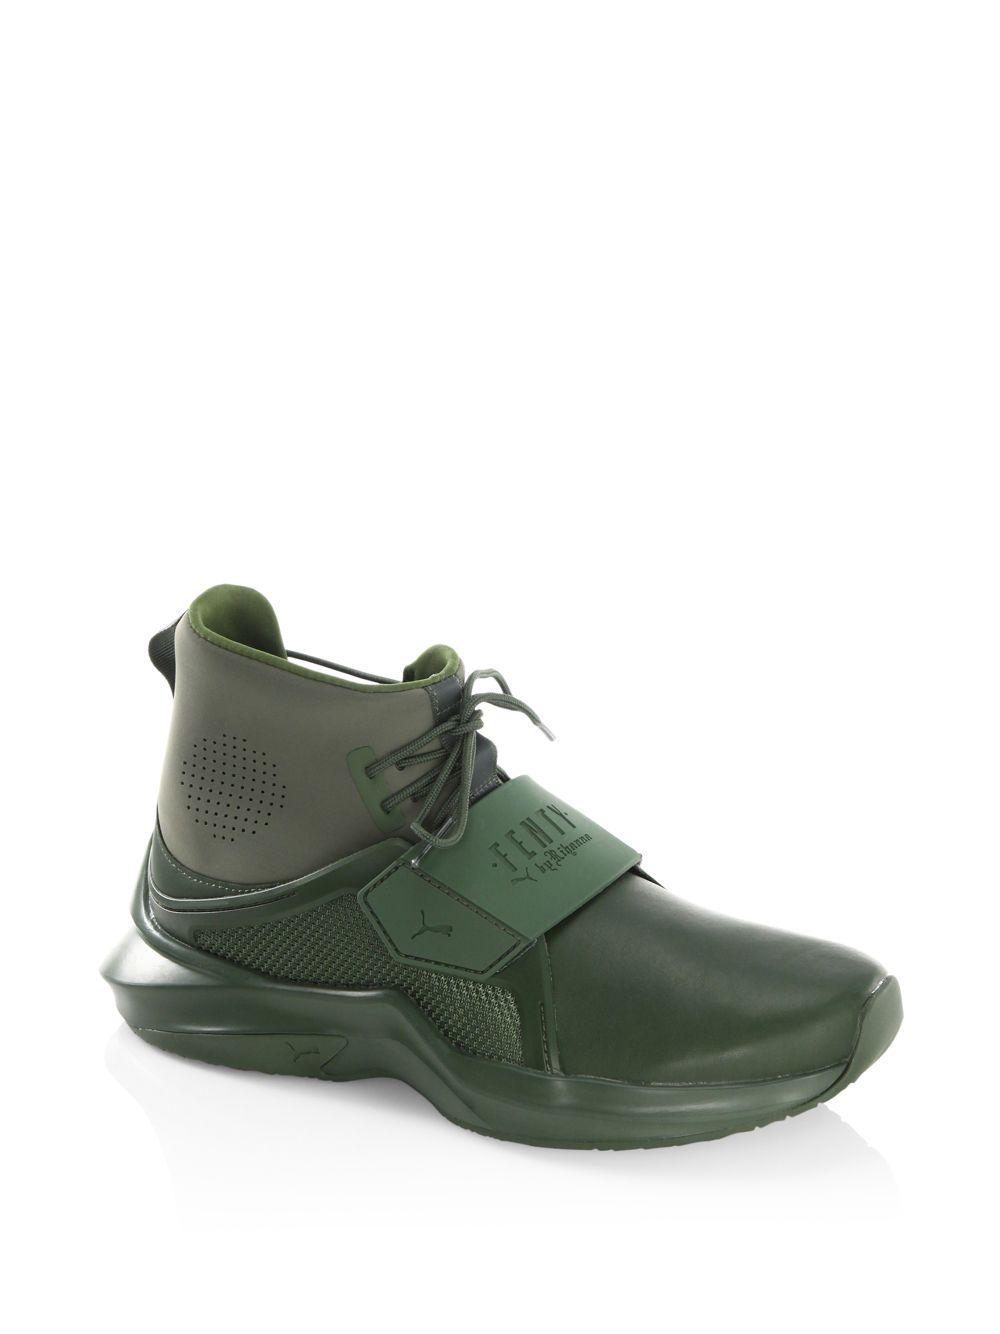 059750ff92b226 Lyst - PUMA Fenty By Rihanna Hi-top Trainer Sneakers in Green for Men